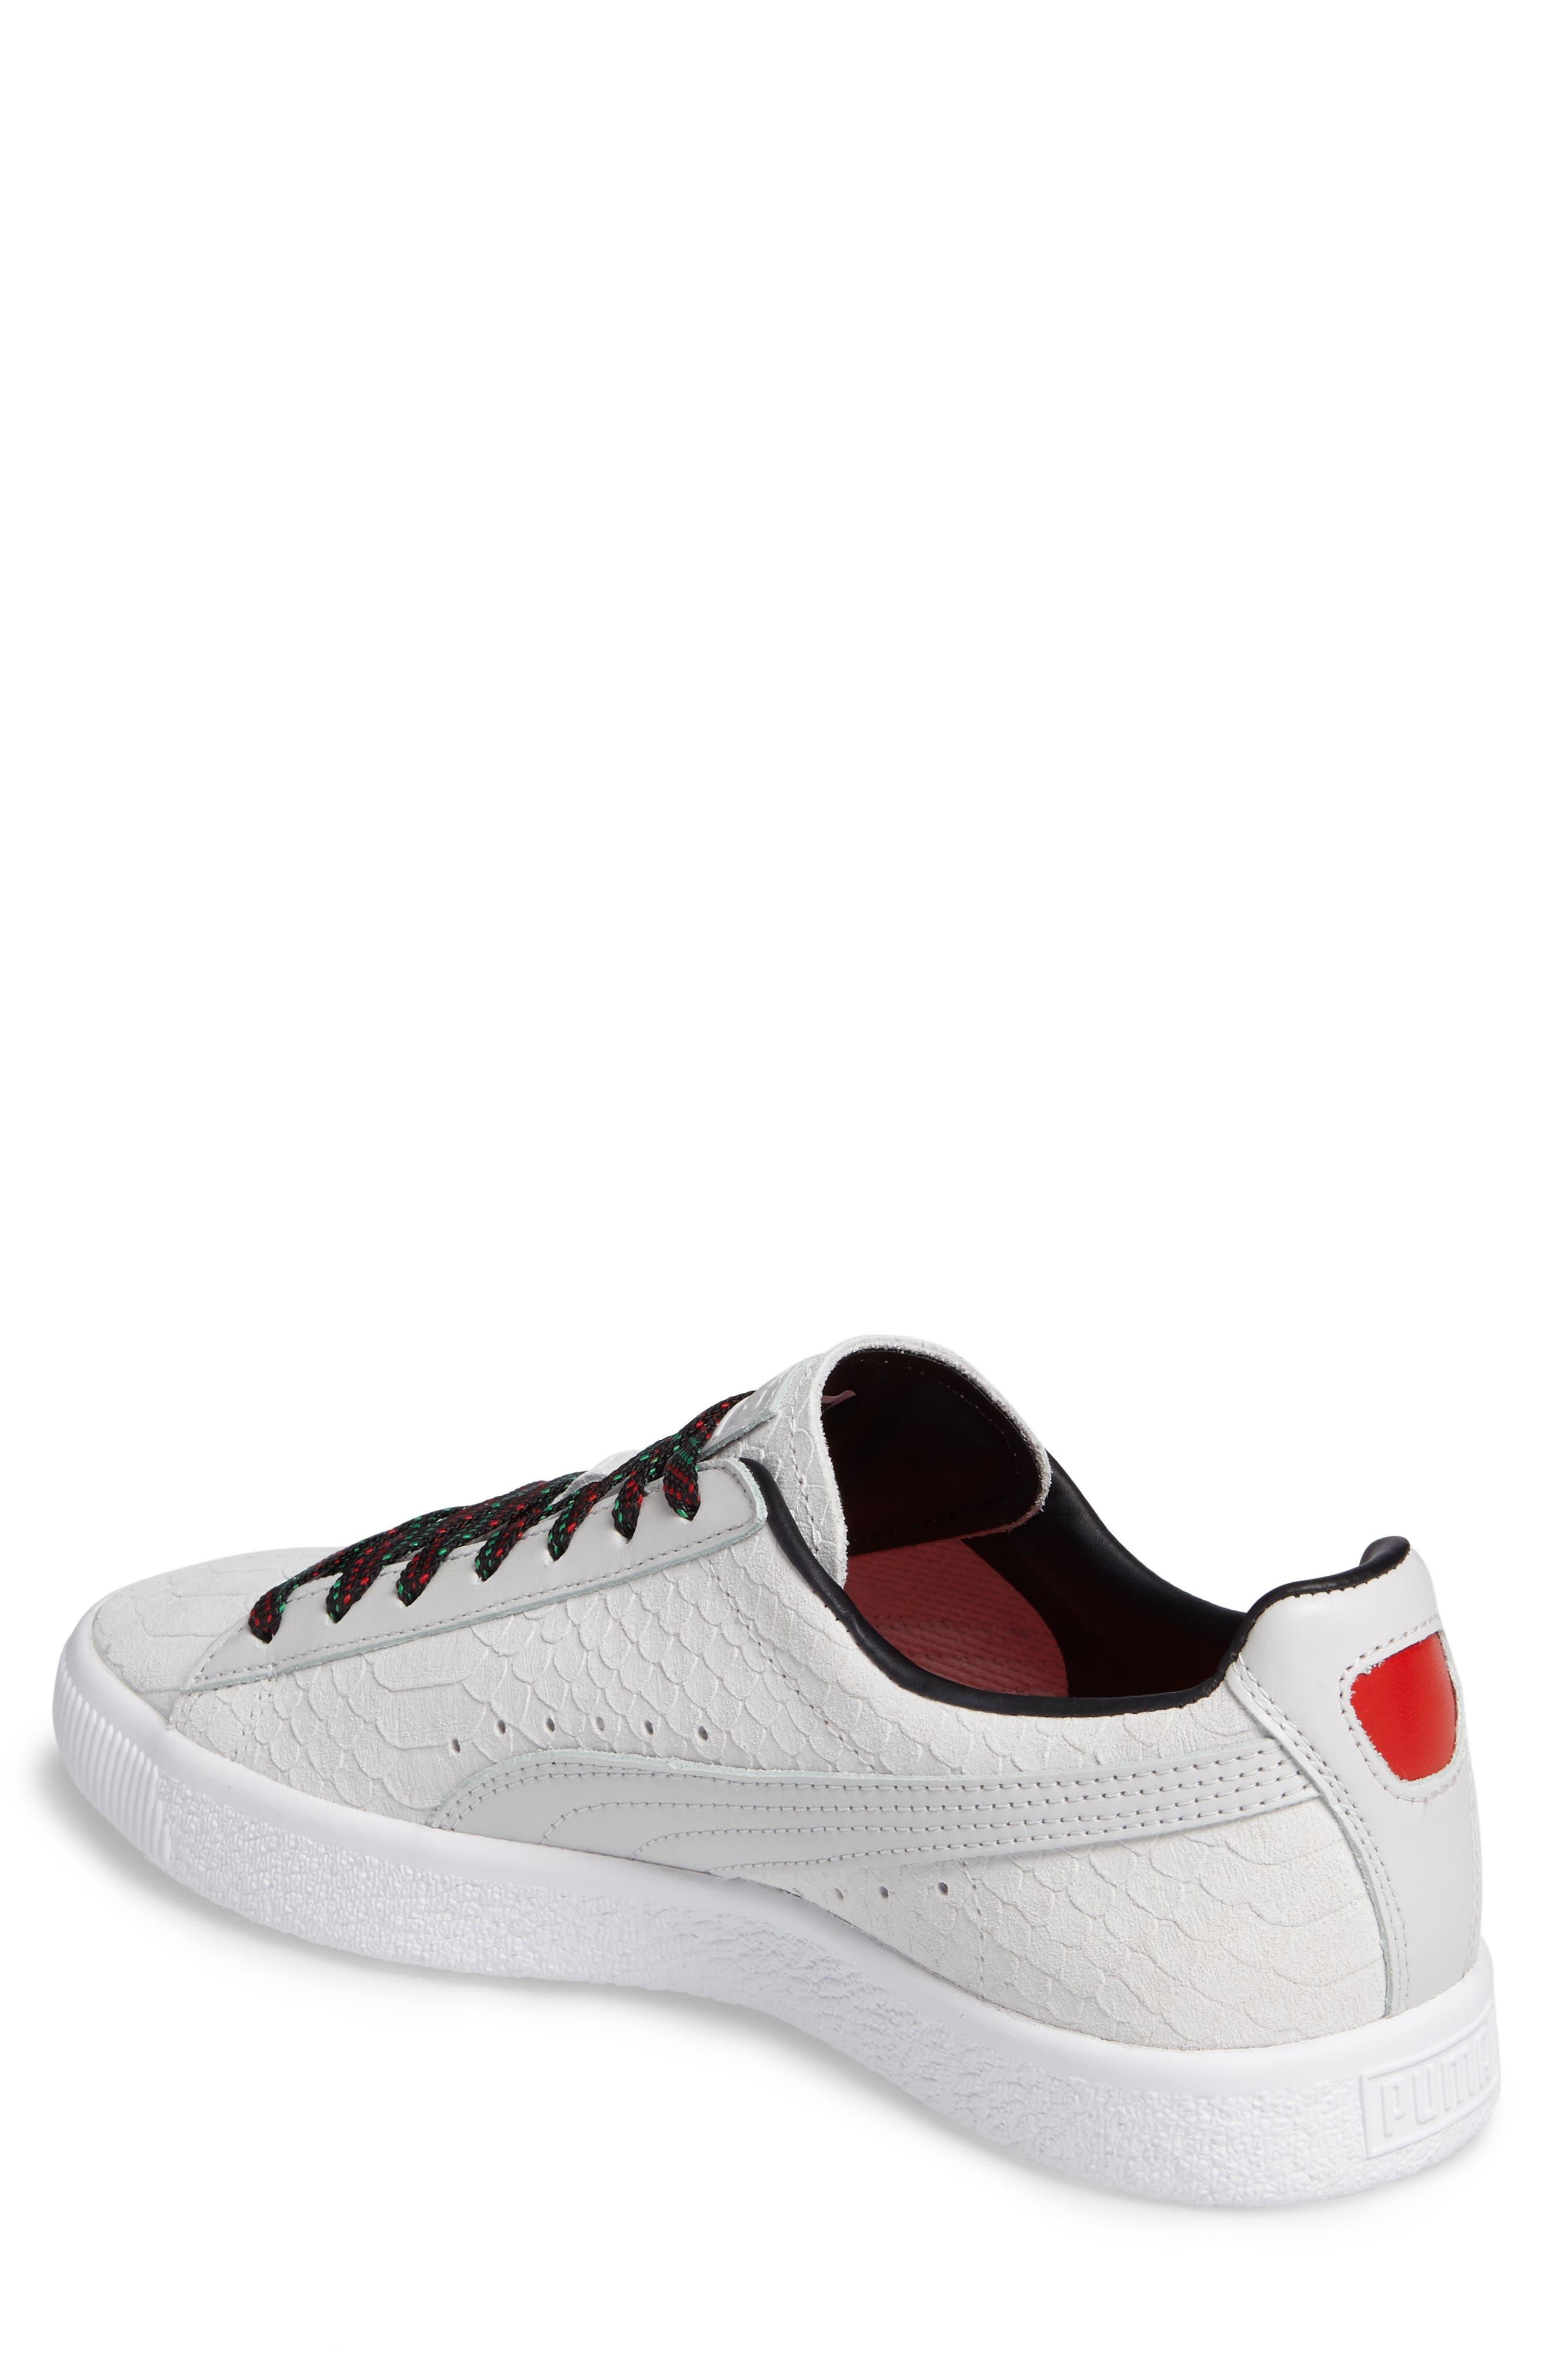 Clyde GCC Sneaker,                             Alternate thumbnail 2, color,                             White/ Puma Black